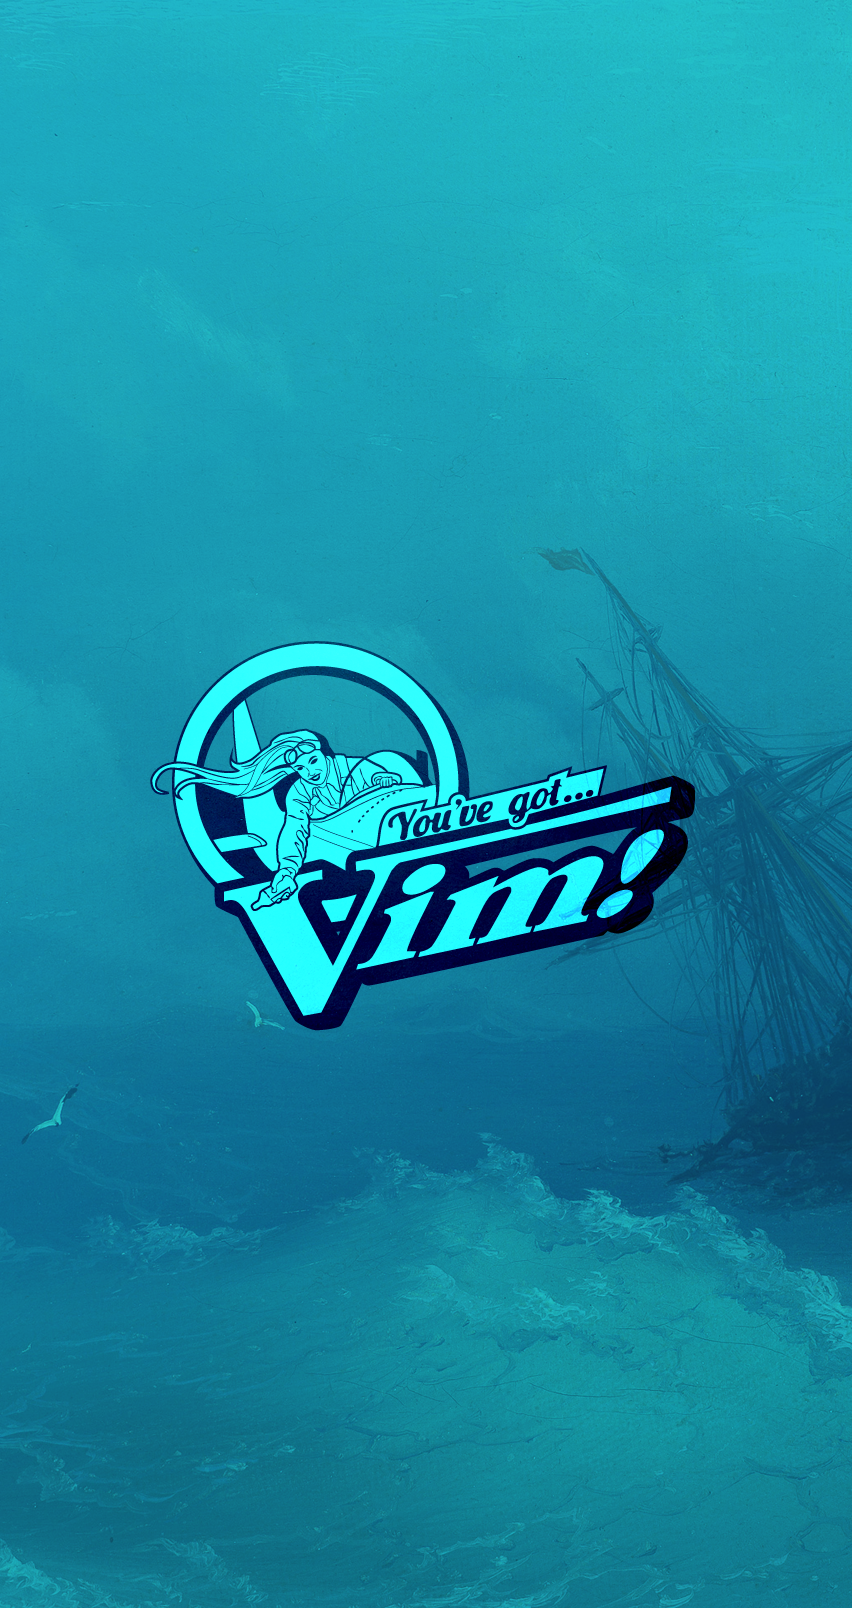 Top Wallpaper Logo Fallout 4 - fallout_4___vim_iphone_wallpaper_by_gorillatamer-da5rodz  Snapshot_426263.png